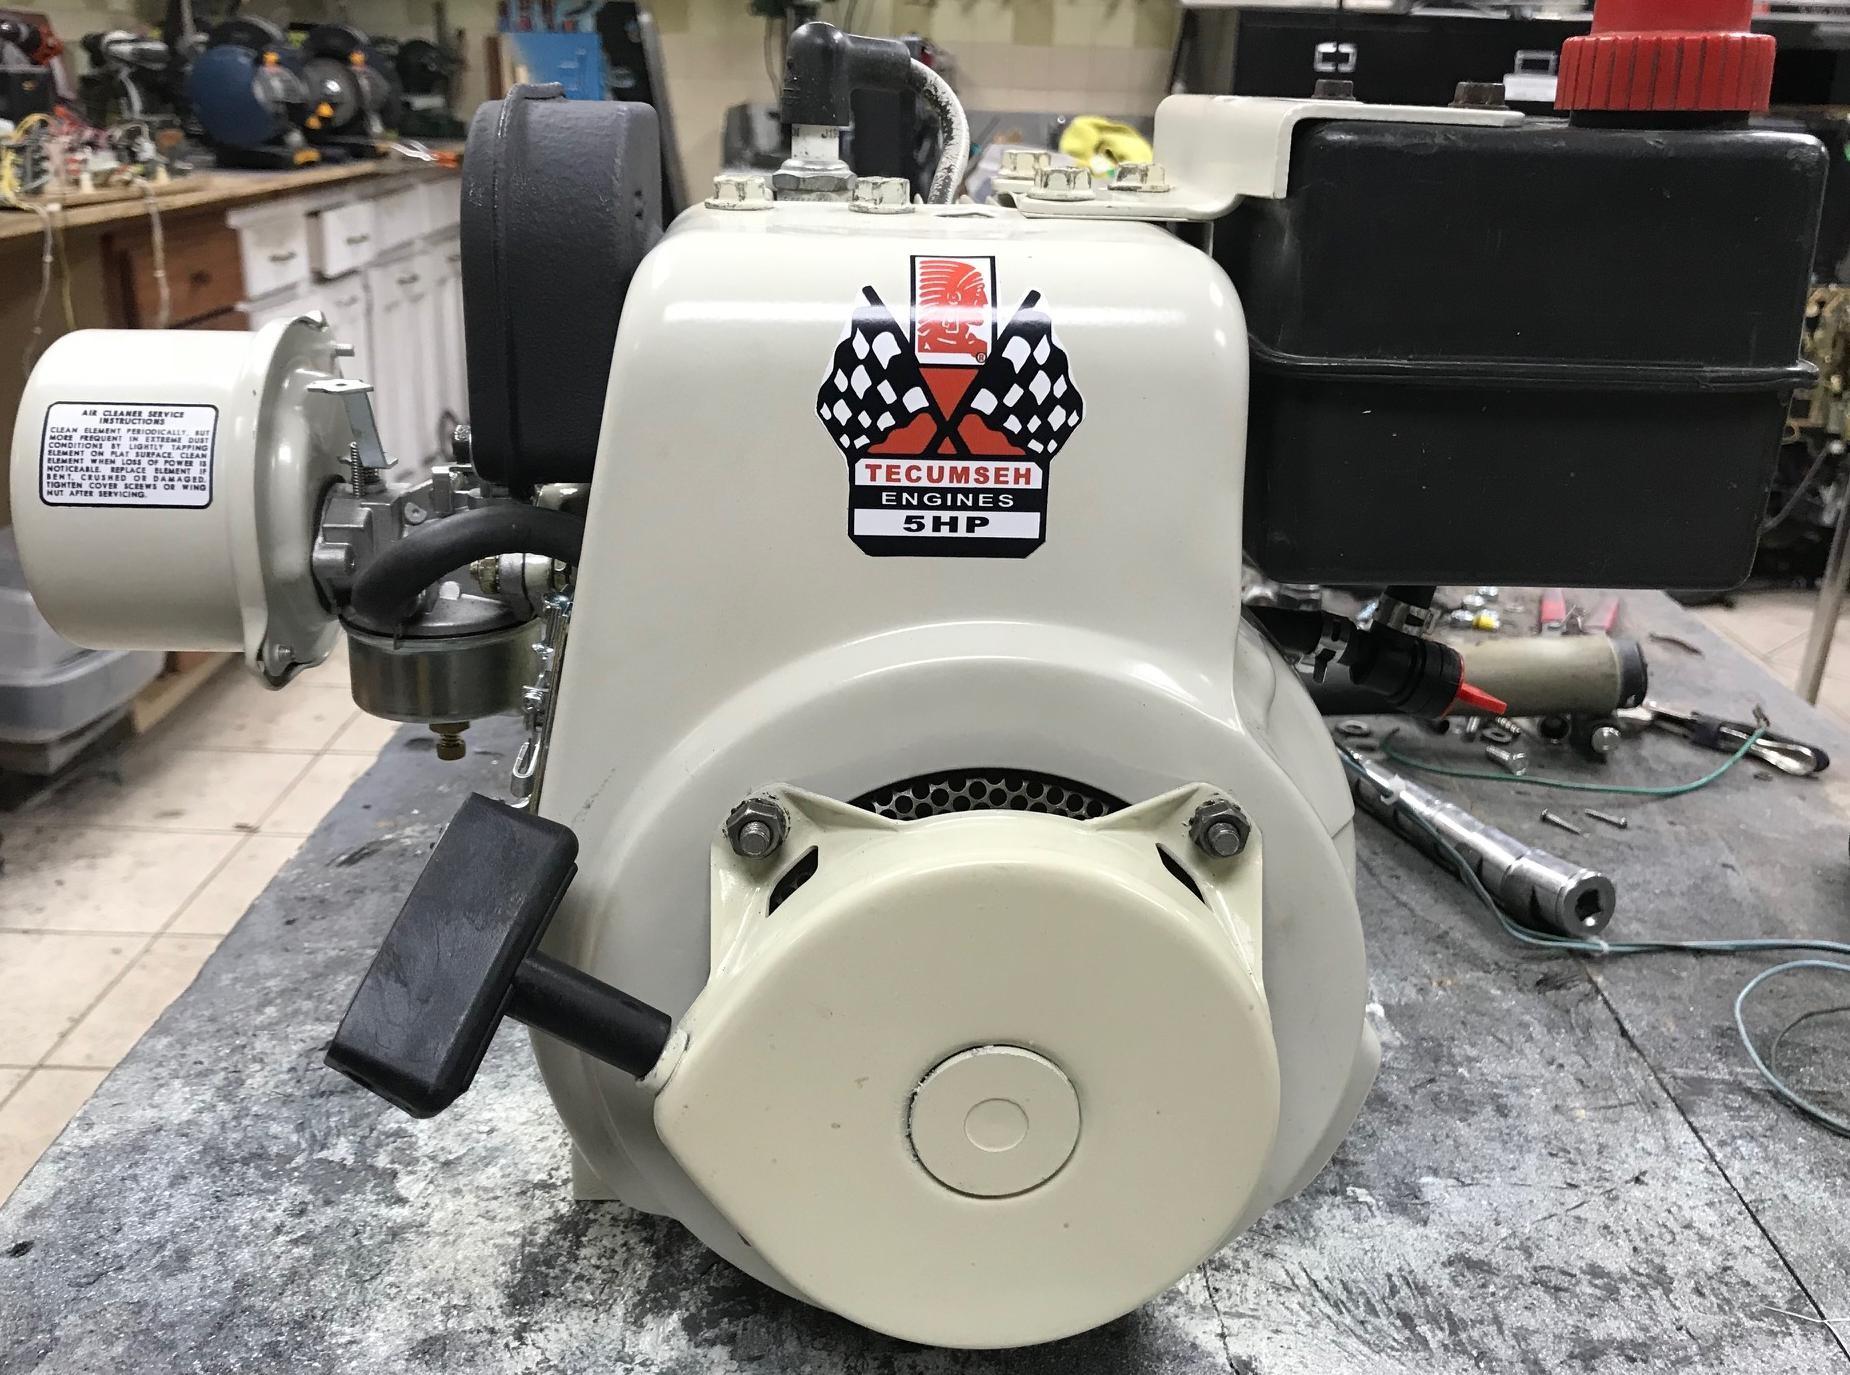 420 Predator Engine Wiring Schematic Tecumseh Engine Rebuild for Mini Bikes Conversion From Snow Of 420 Predator Engine Wiring Schematic